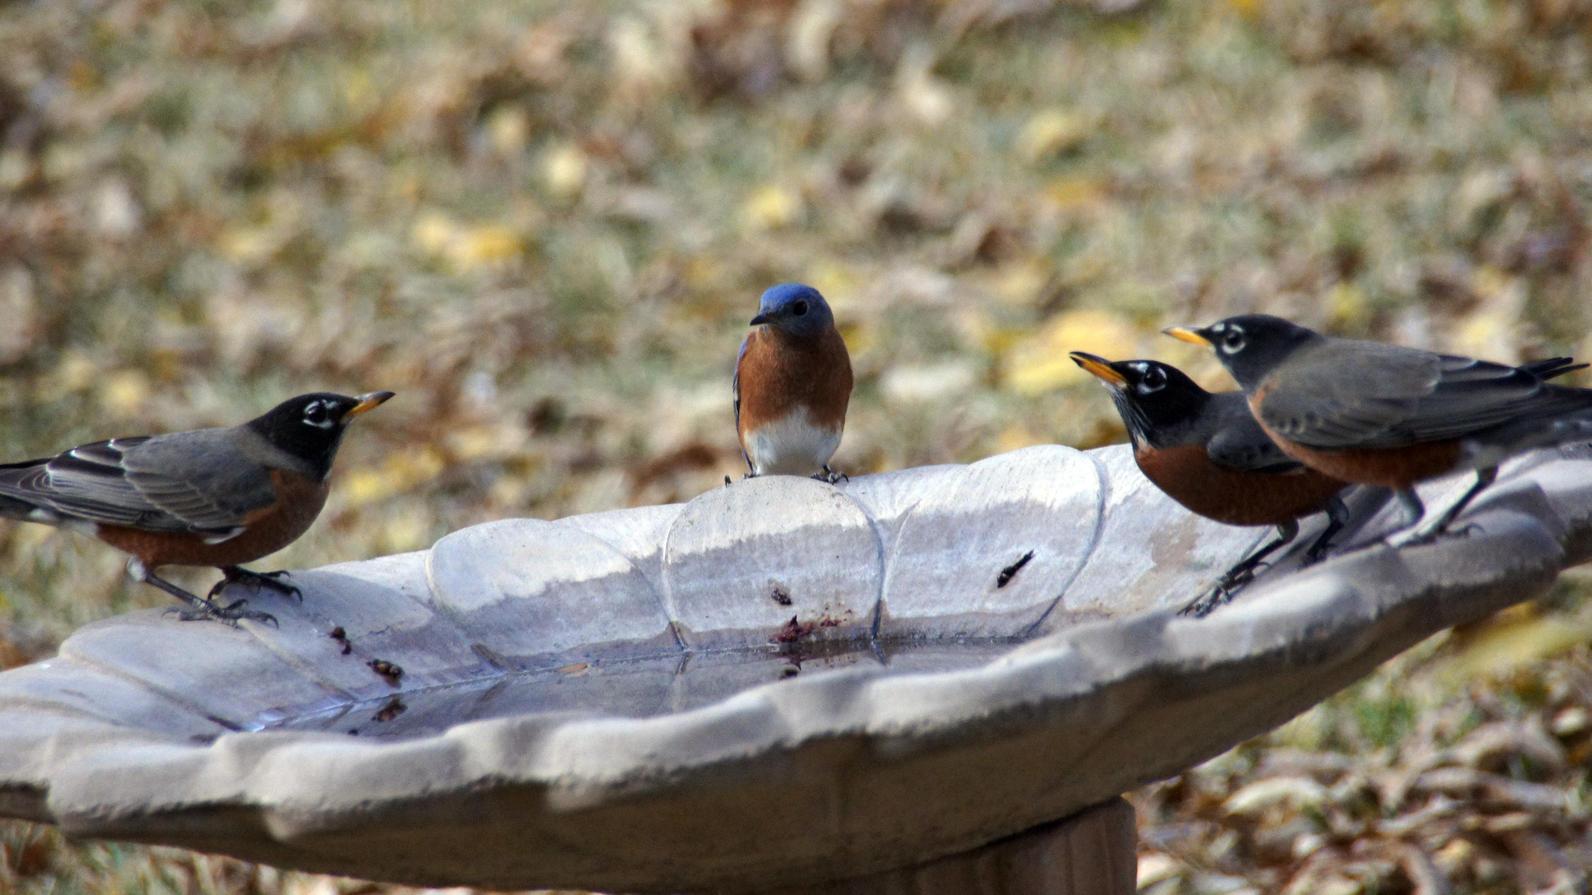 How to make a birdbath - Photo Patrick Denker Flickr Cc